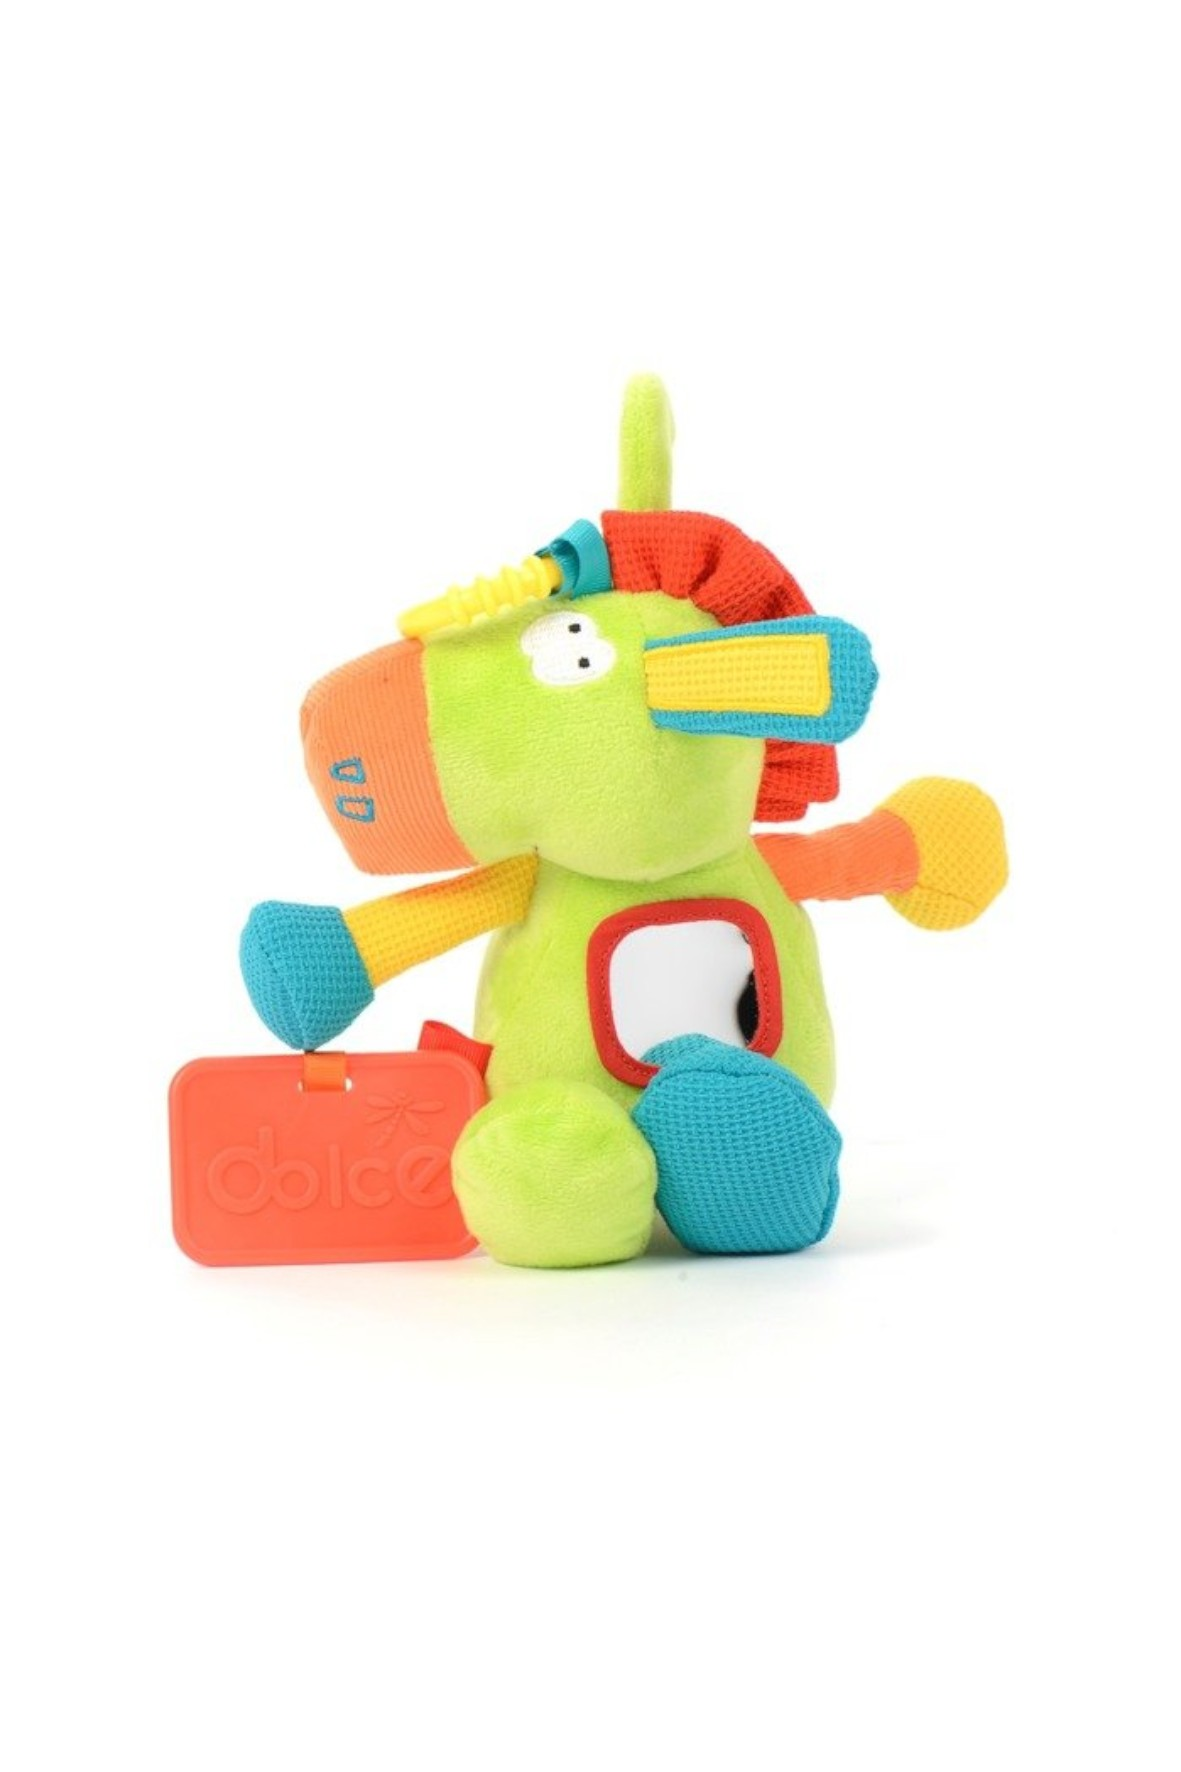 Wiosenny Konik- zabawka sensoryczna Dolce